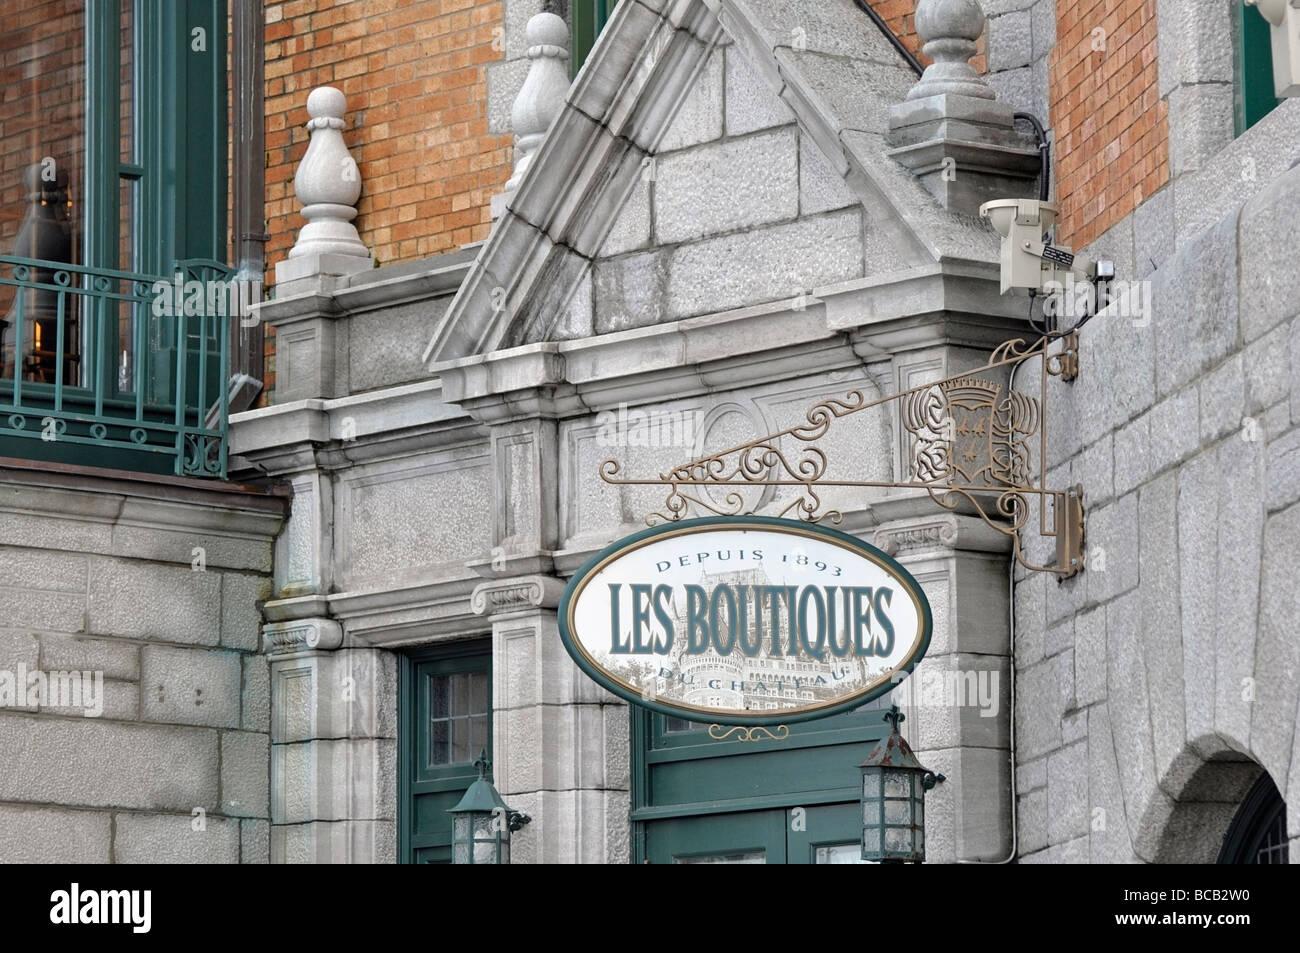 Les Boutiques Sign, Quebec City, near Chateau Frontenac & Dufferin Terrace - Stock Image